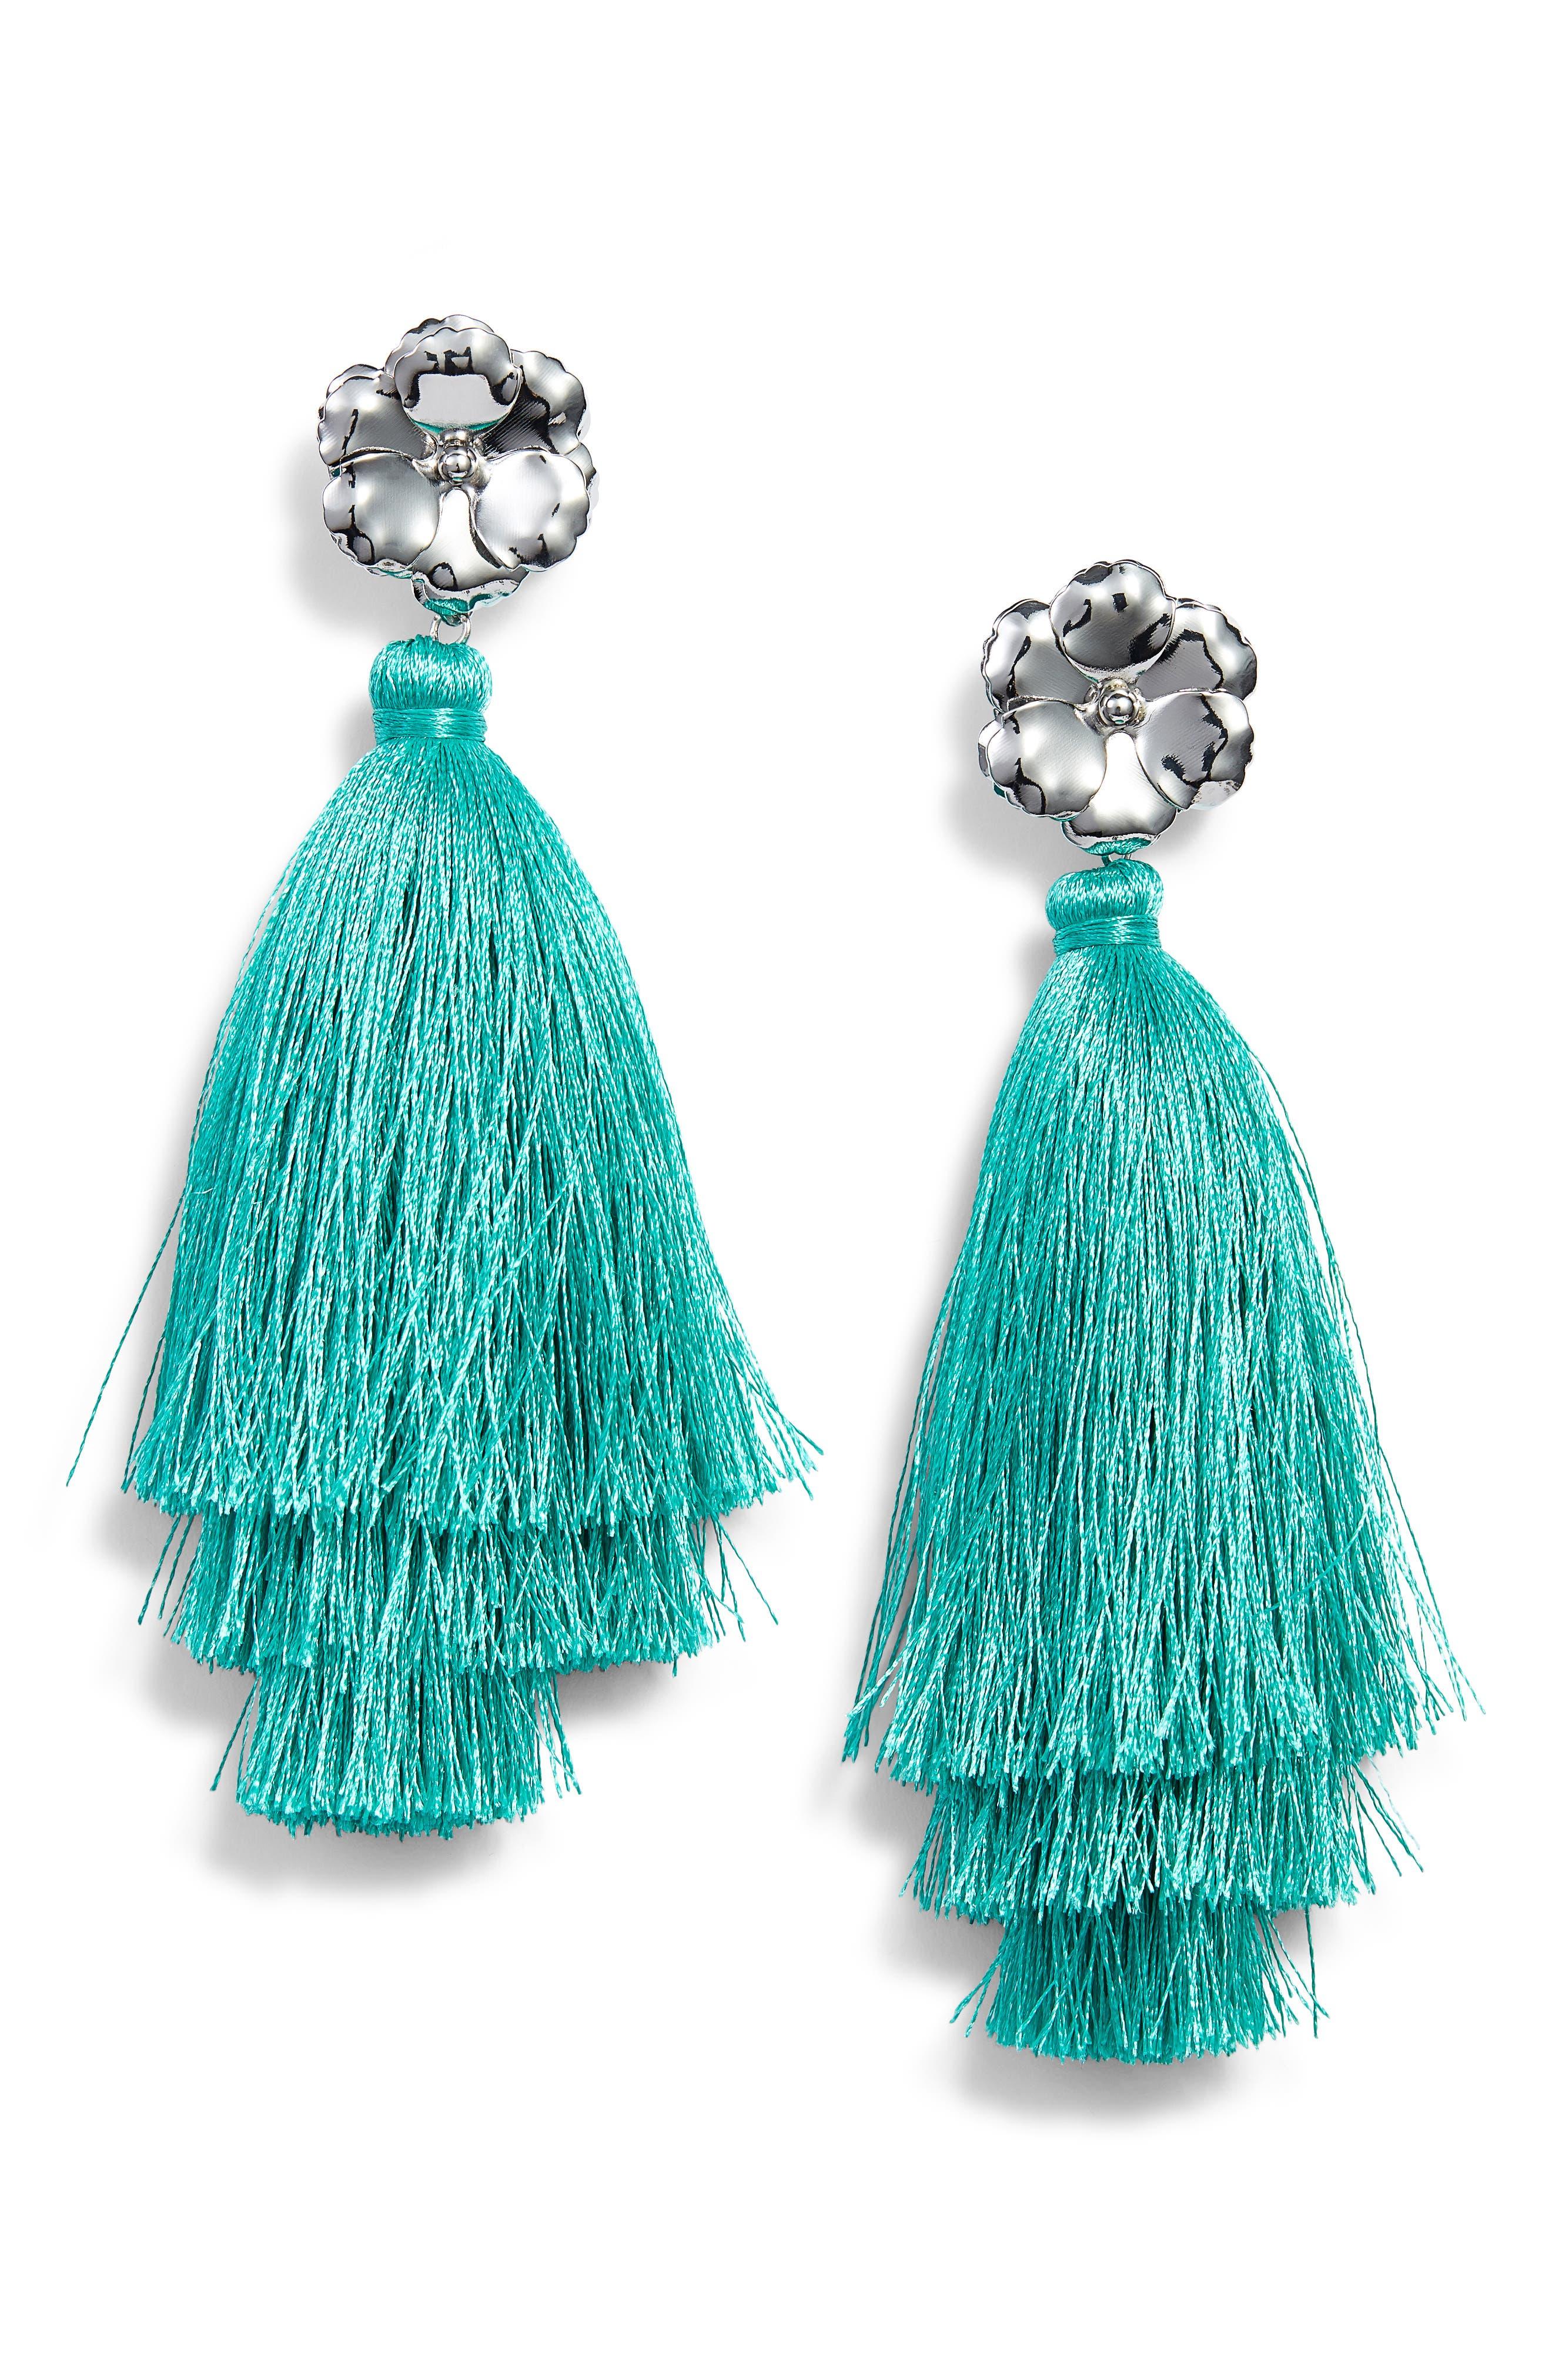 Halogen Floral Tassel Drop Earrings,                             Main thumbnail 1, color,                             Teal- Rhodium